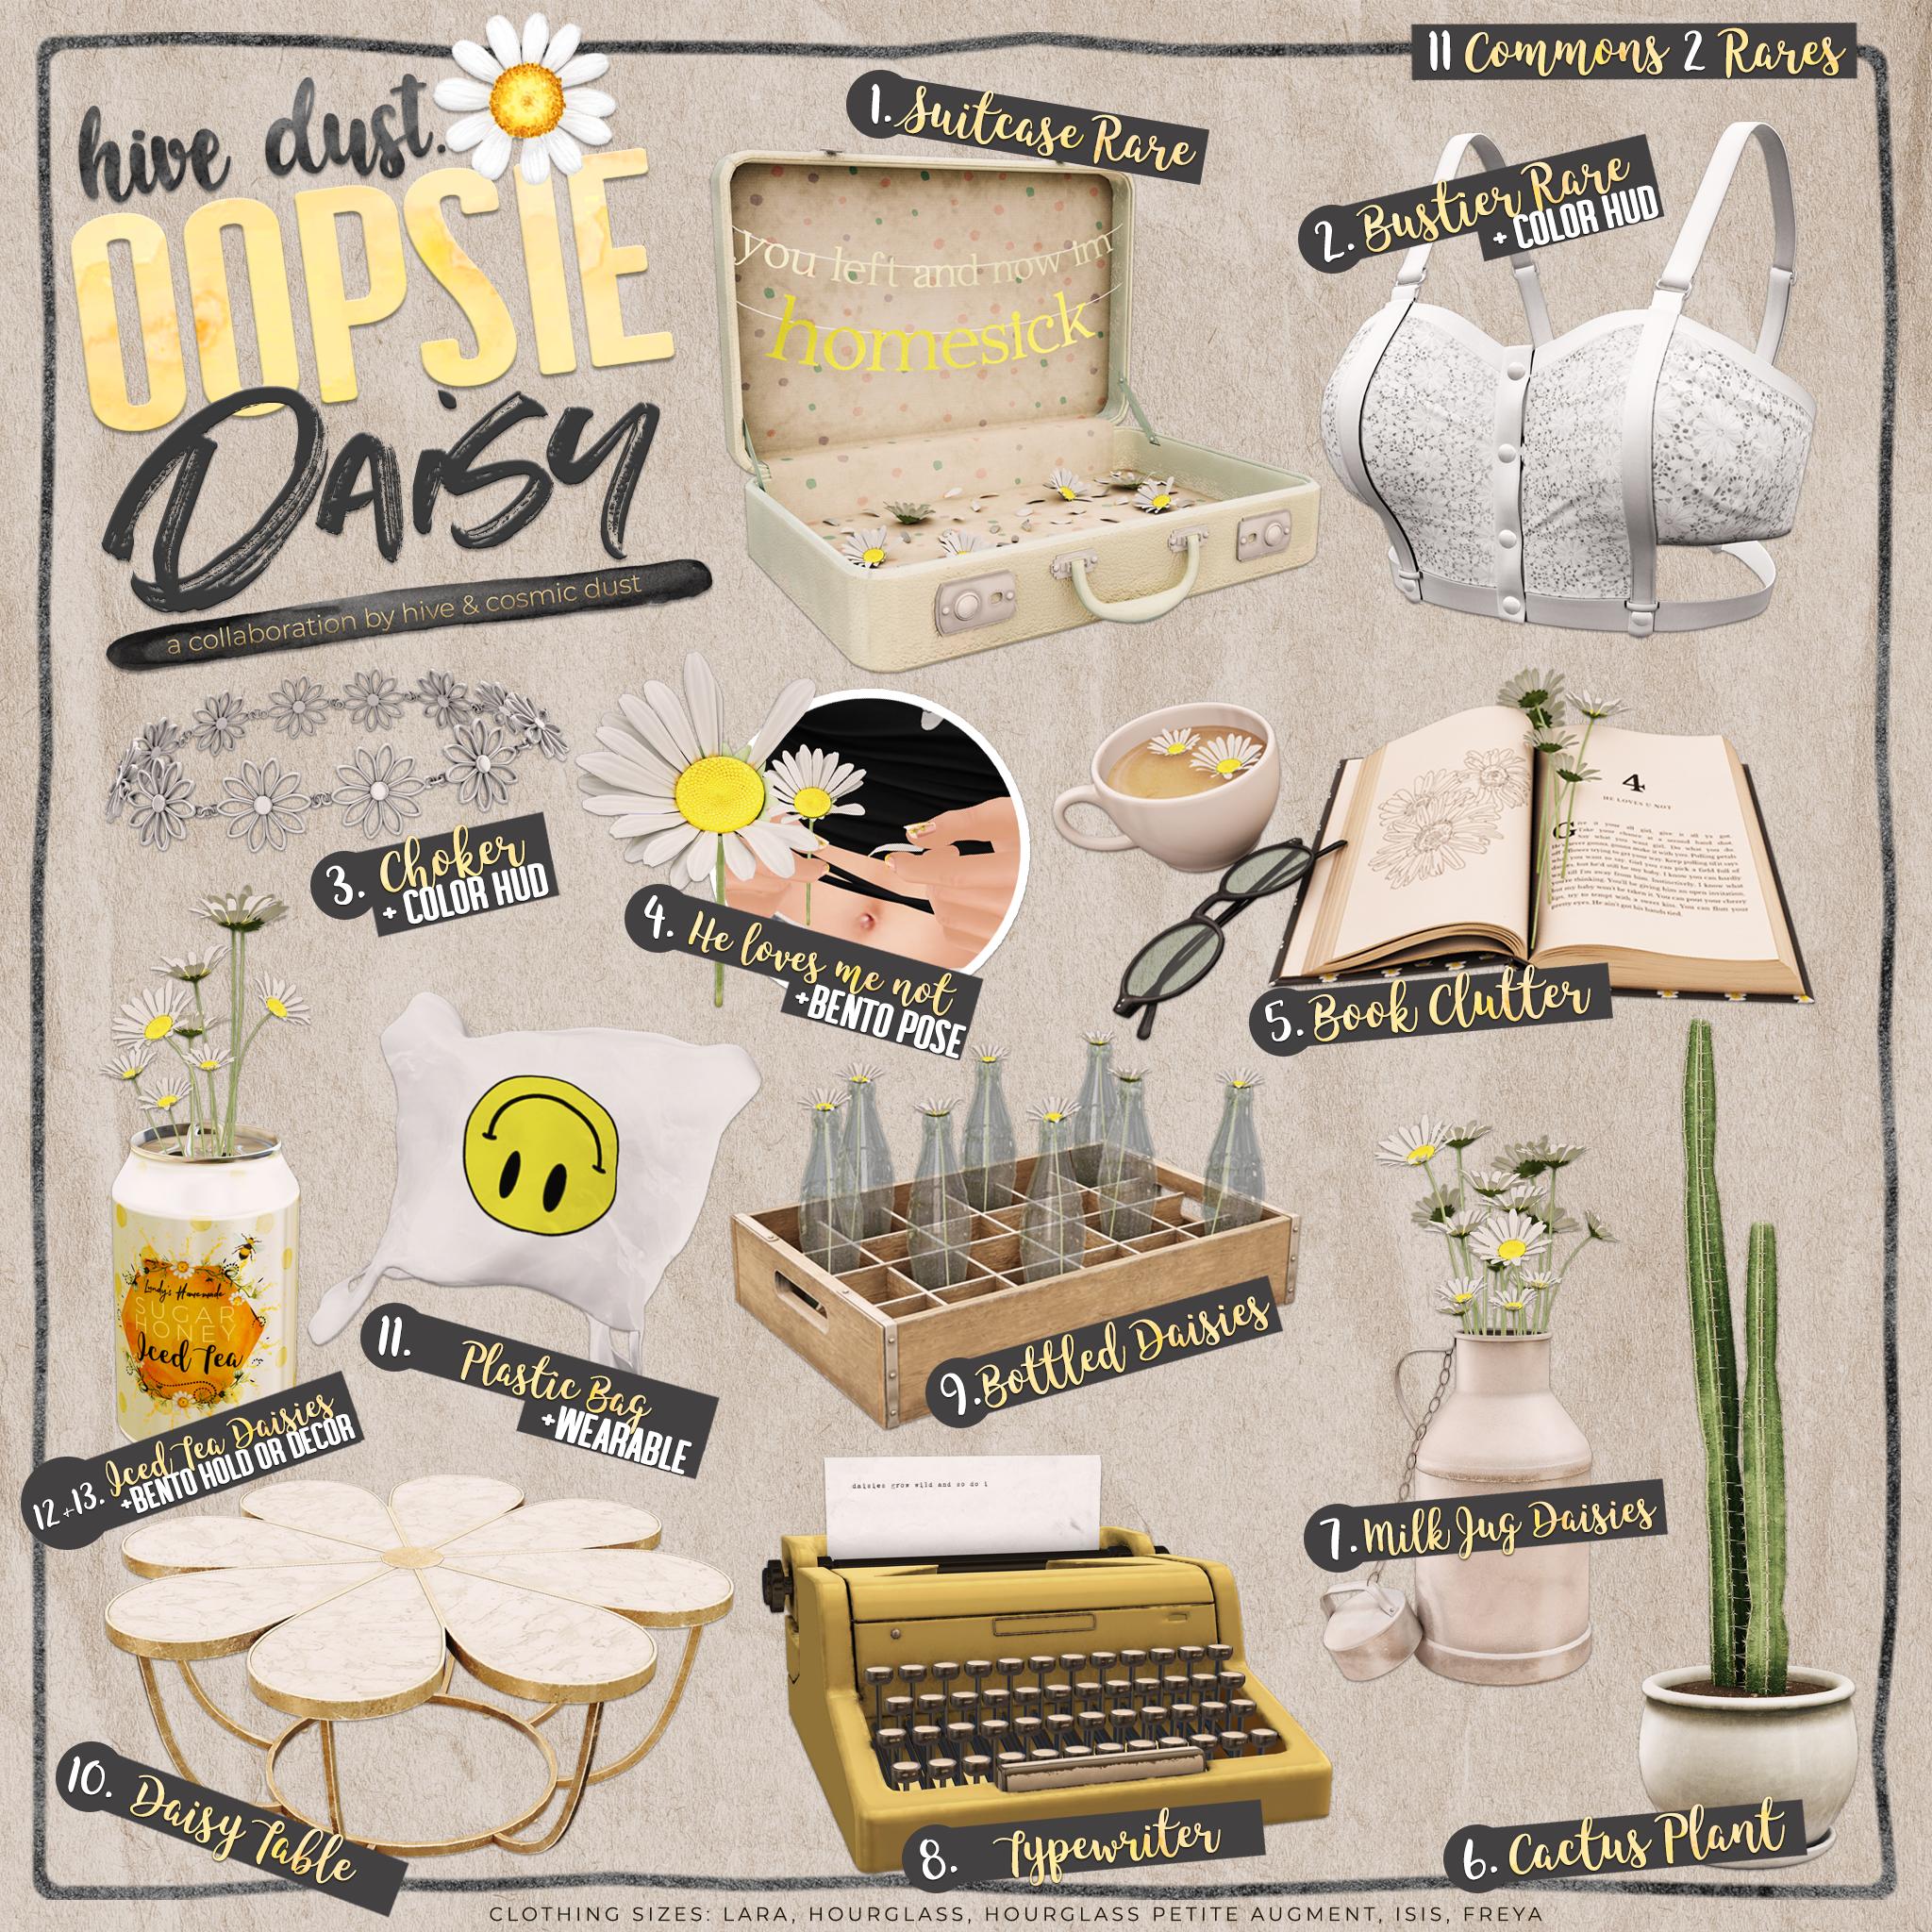 hive dust - oopsie daisy gacha key.png